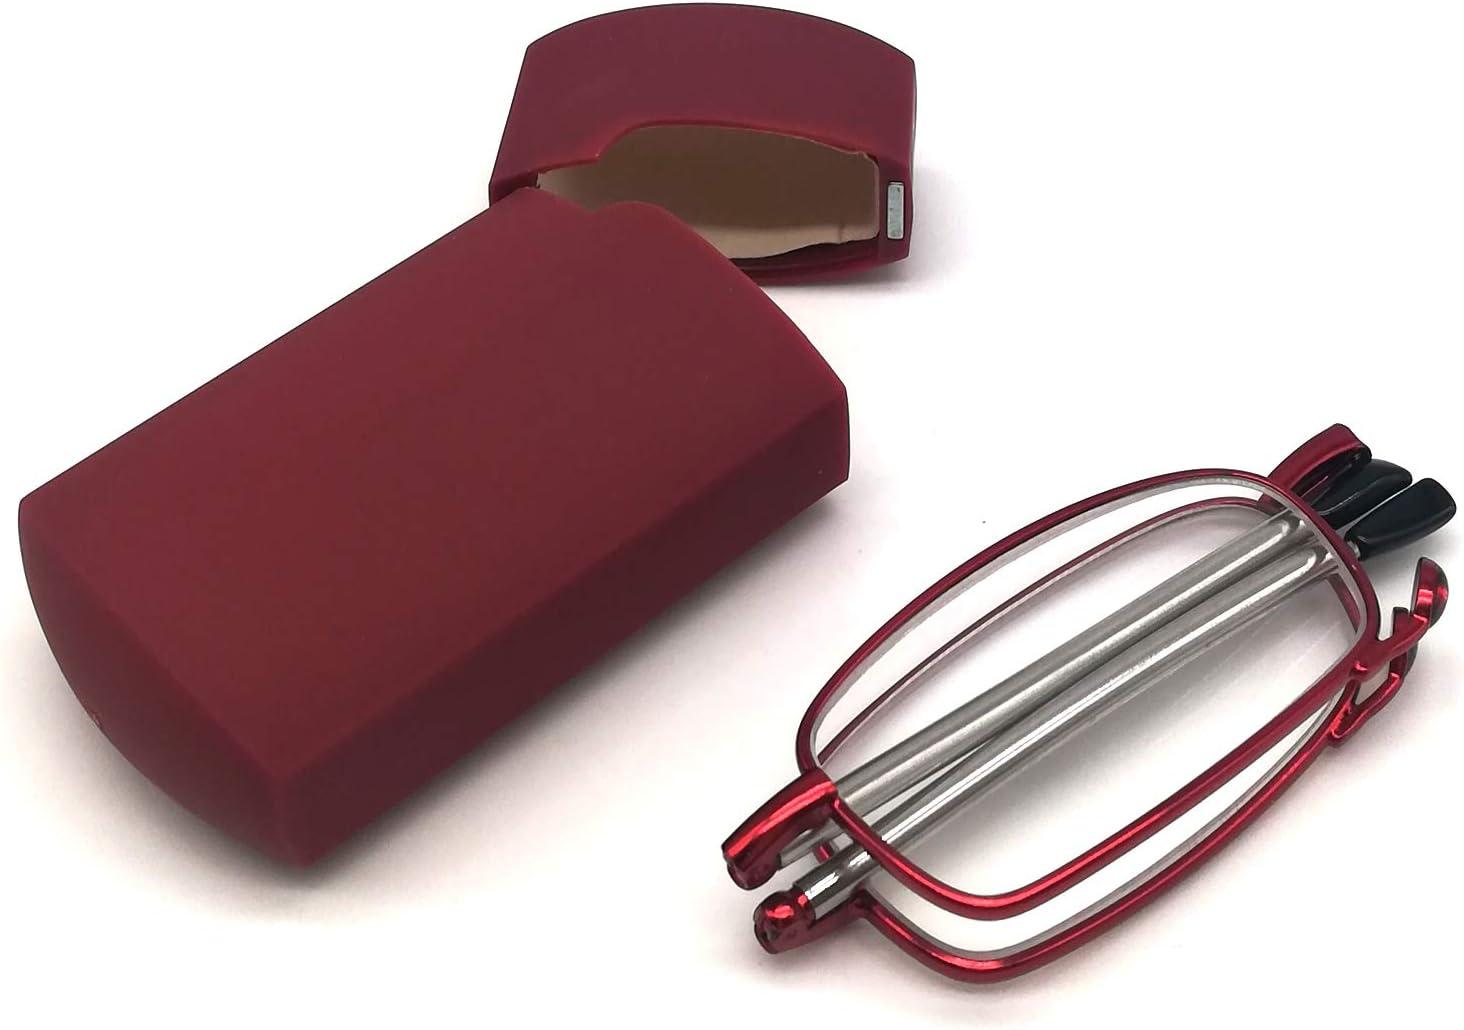 TourKing Gafas de Lectura Plegables de Metal Compactas con Patillas Telescópicas, Gafas de lectura plegables flexibles con estuche,Gafas Unisex Para De Lectura